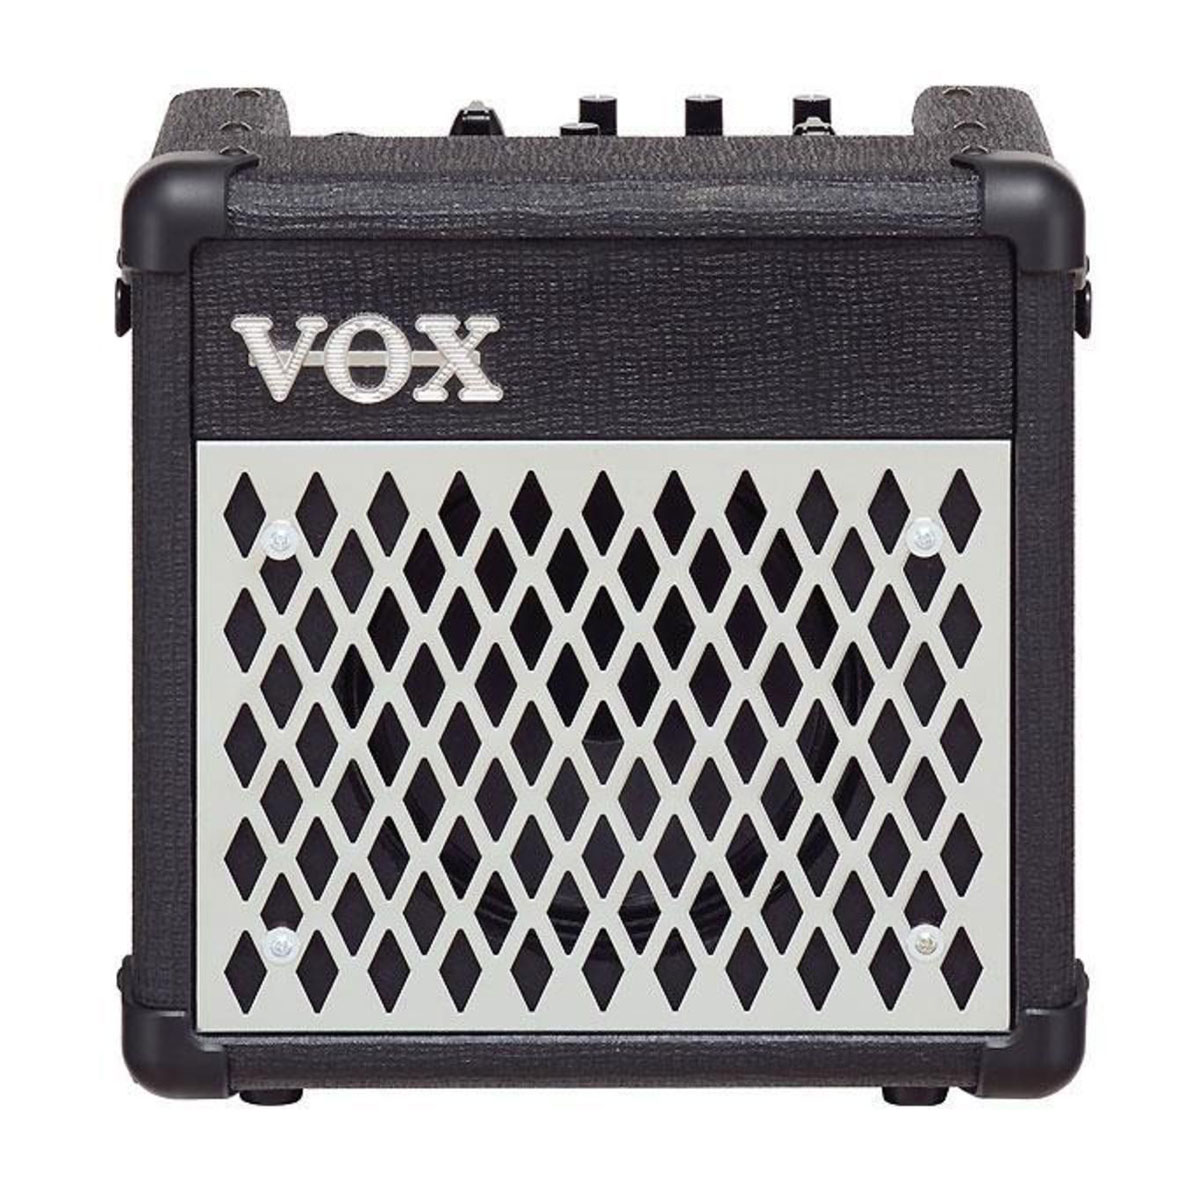 VOX DA5 Gitarrenamp Gitarrenverstärker • CONCERT IDEE ...